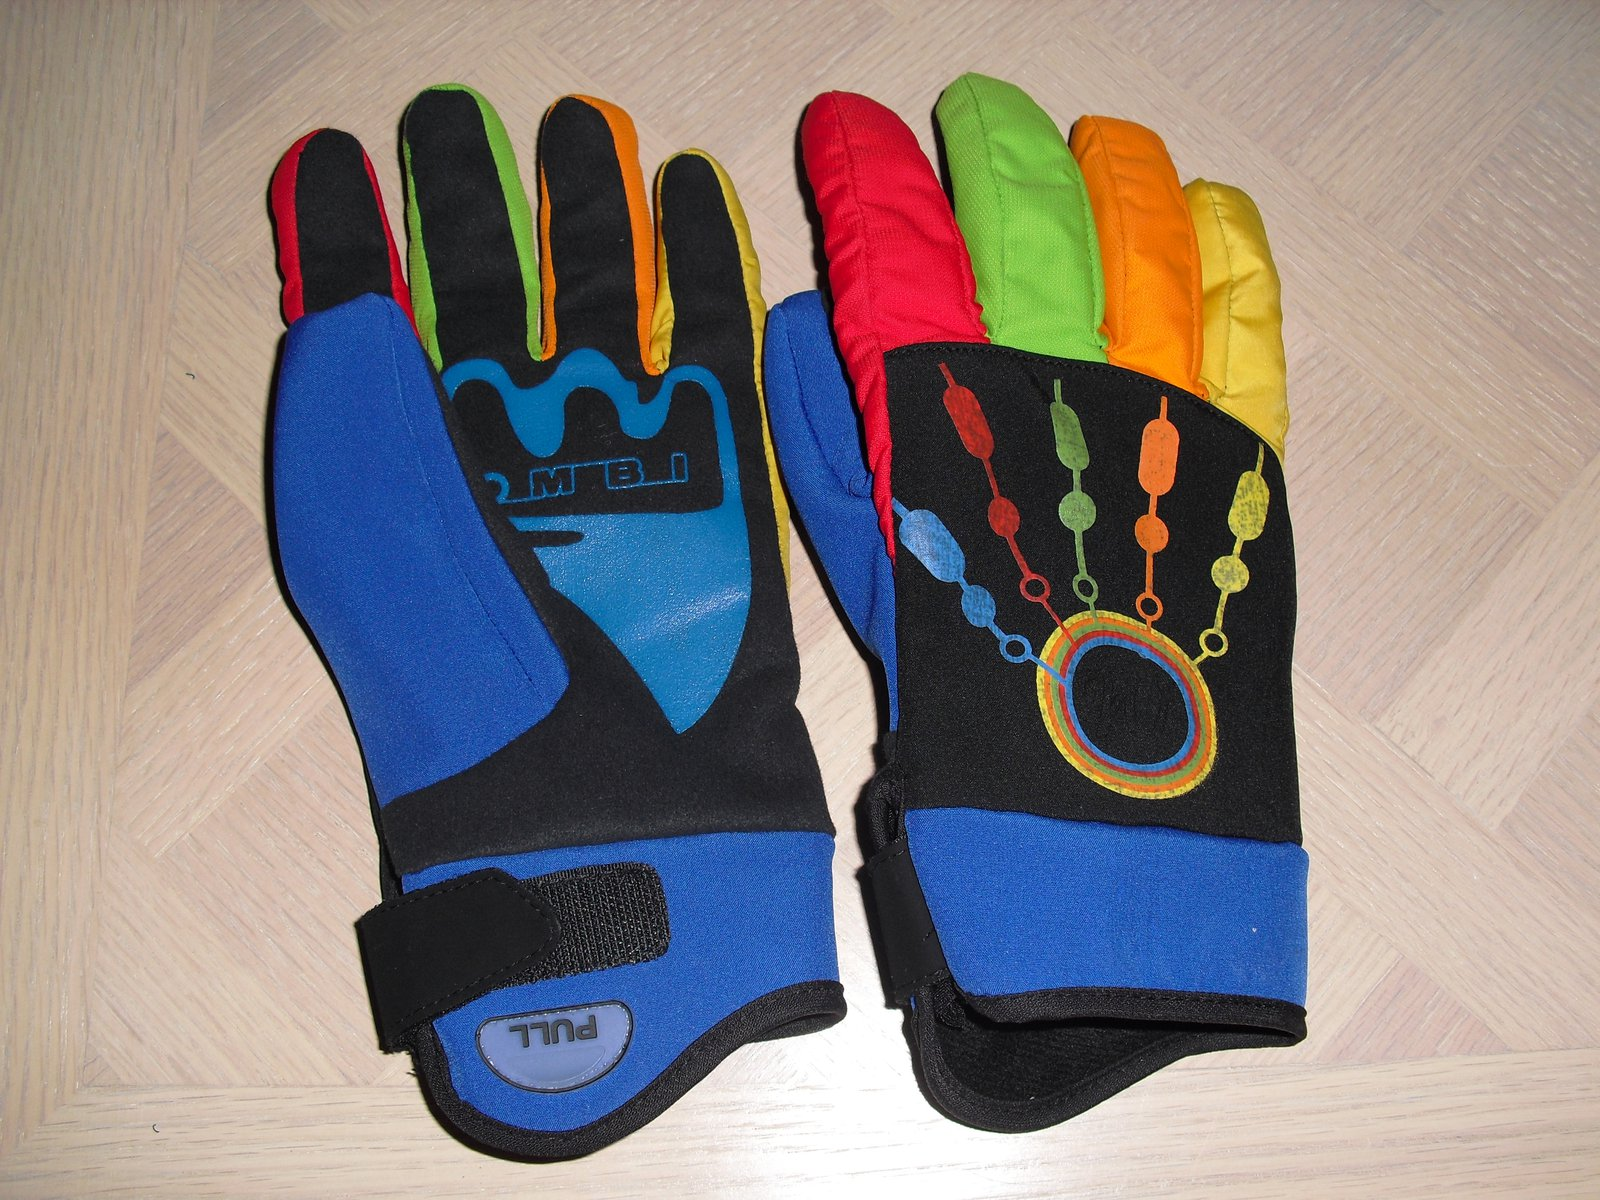 Kombi Twall glove 10-11